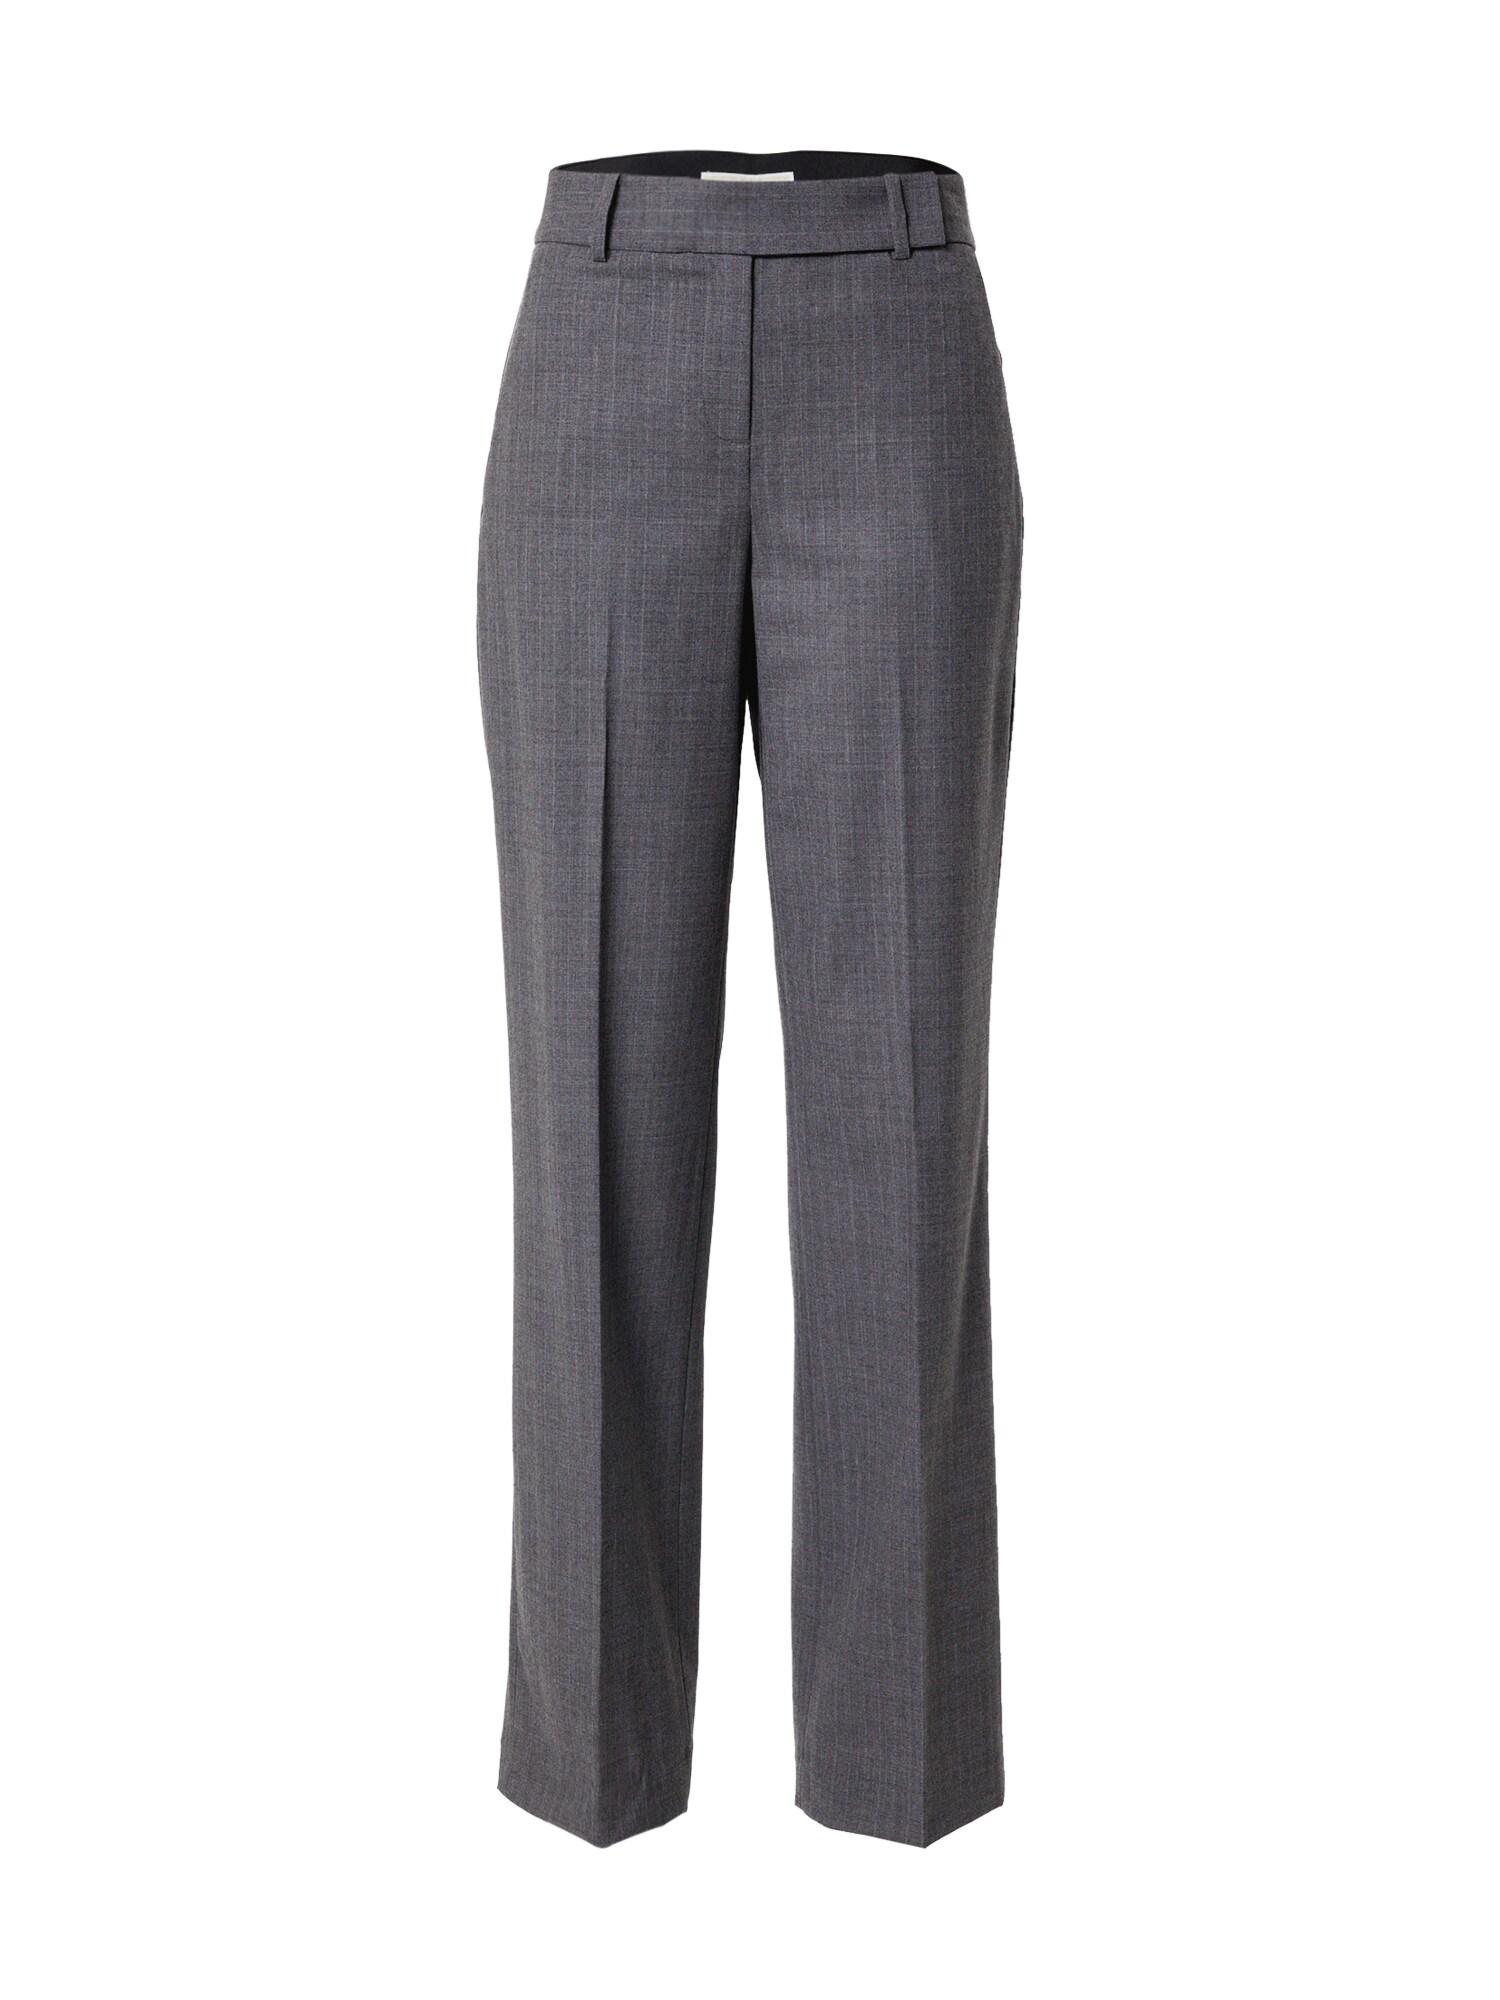 MICHAEL Michael Kors Kelnės su kantu pilka / šviesiai pilka